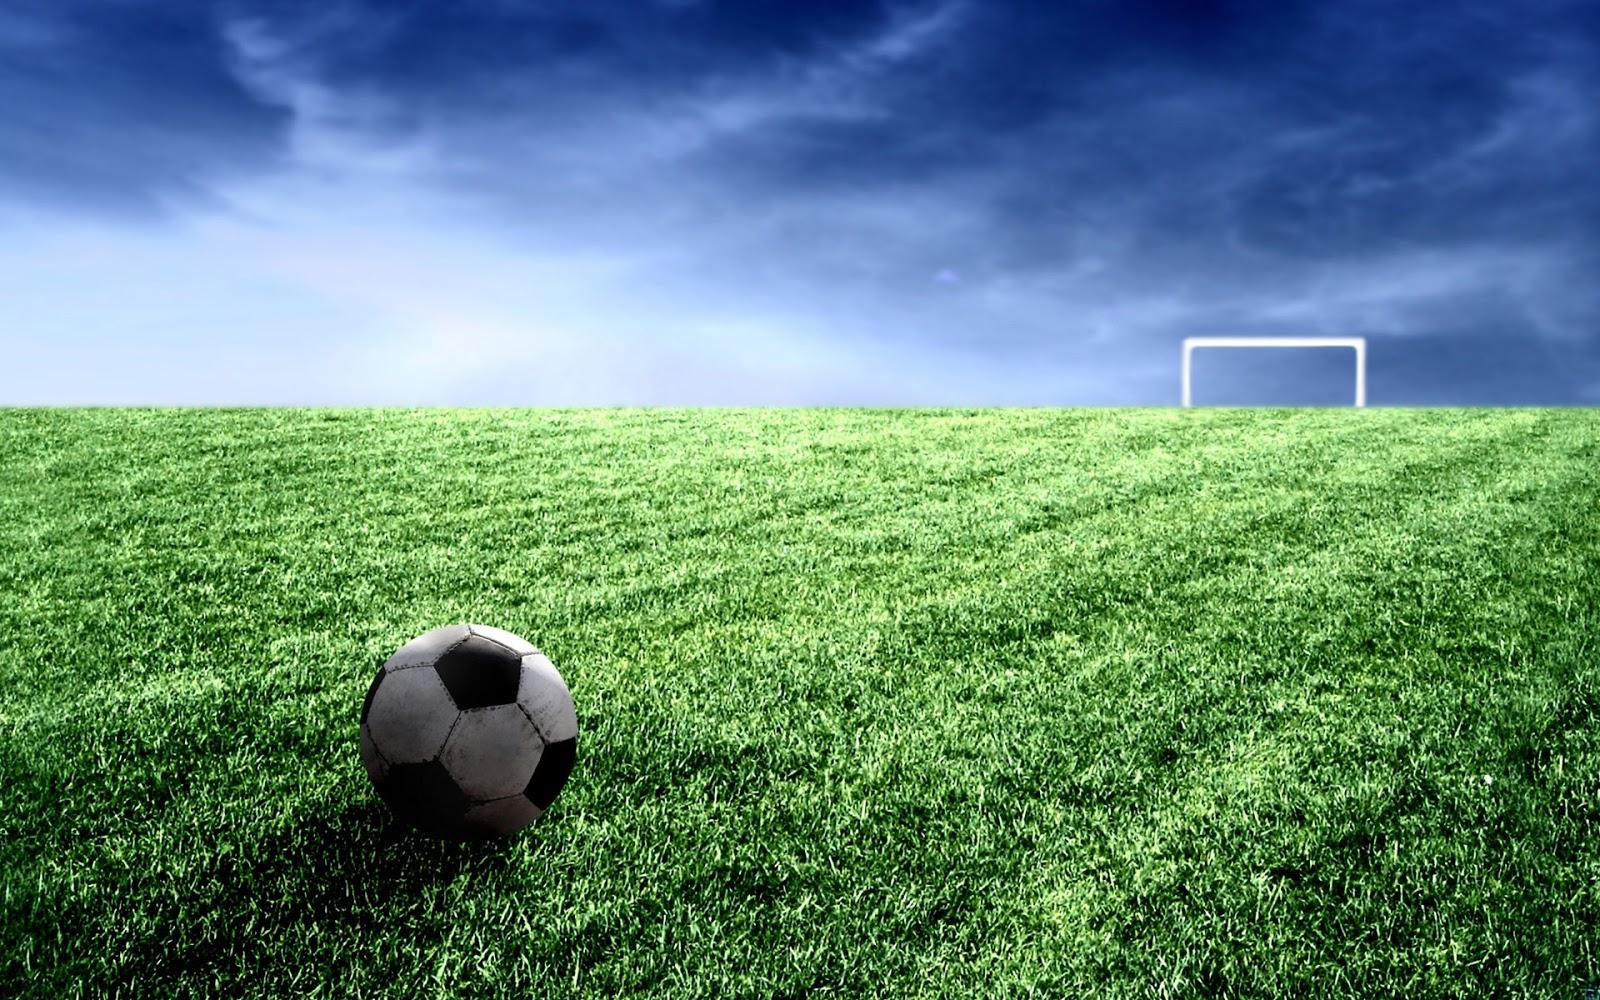 http://3.bp.blogspot.com/-BtcXFN94R6g/UQuuszMQd5I/AAAAAAAABqw/tJ035iRhkkI/s1600/HD_Soccer-football-fresh+hd+wallpapers.jpg